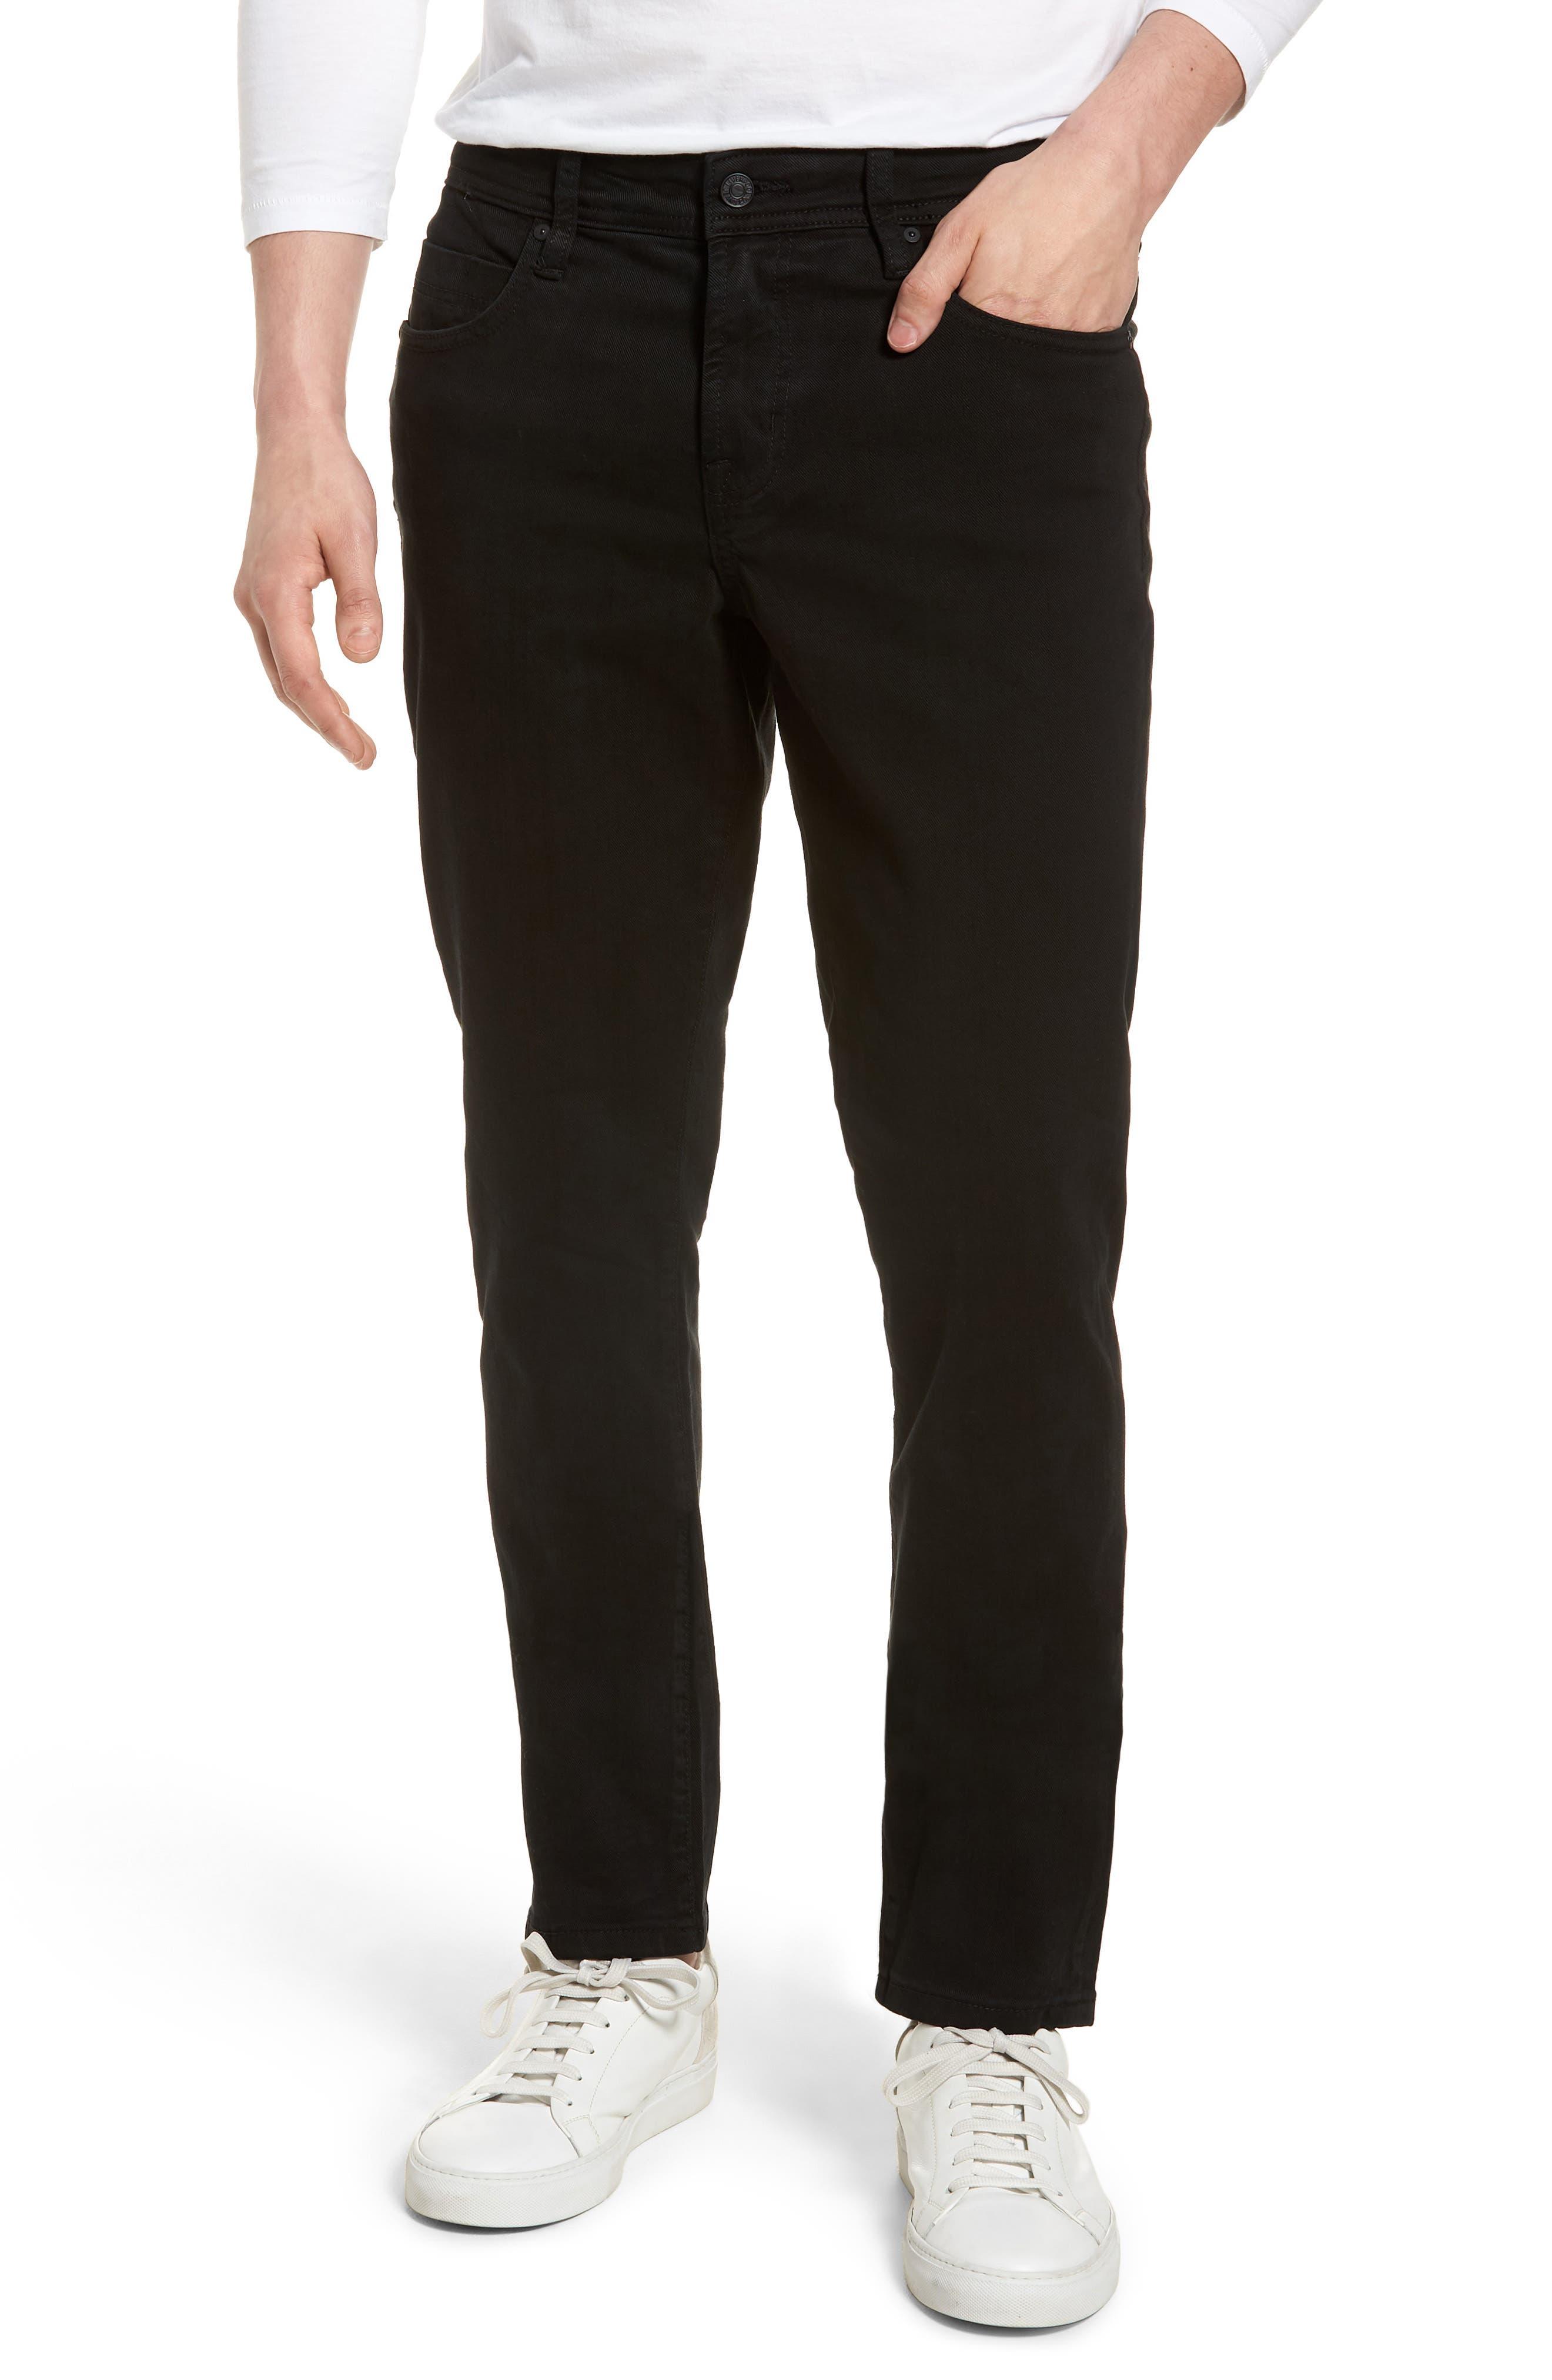 Jeans Co. Kingston Slim Straight Leg Jeans,                         Main,                         color, Black Rinse